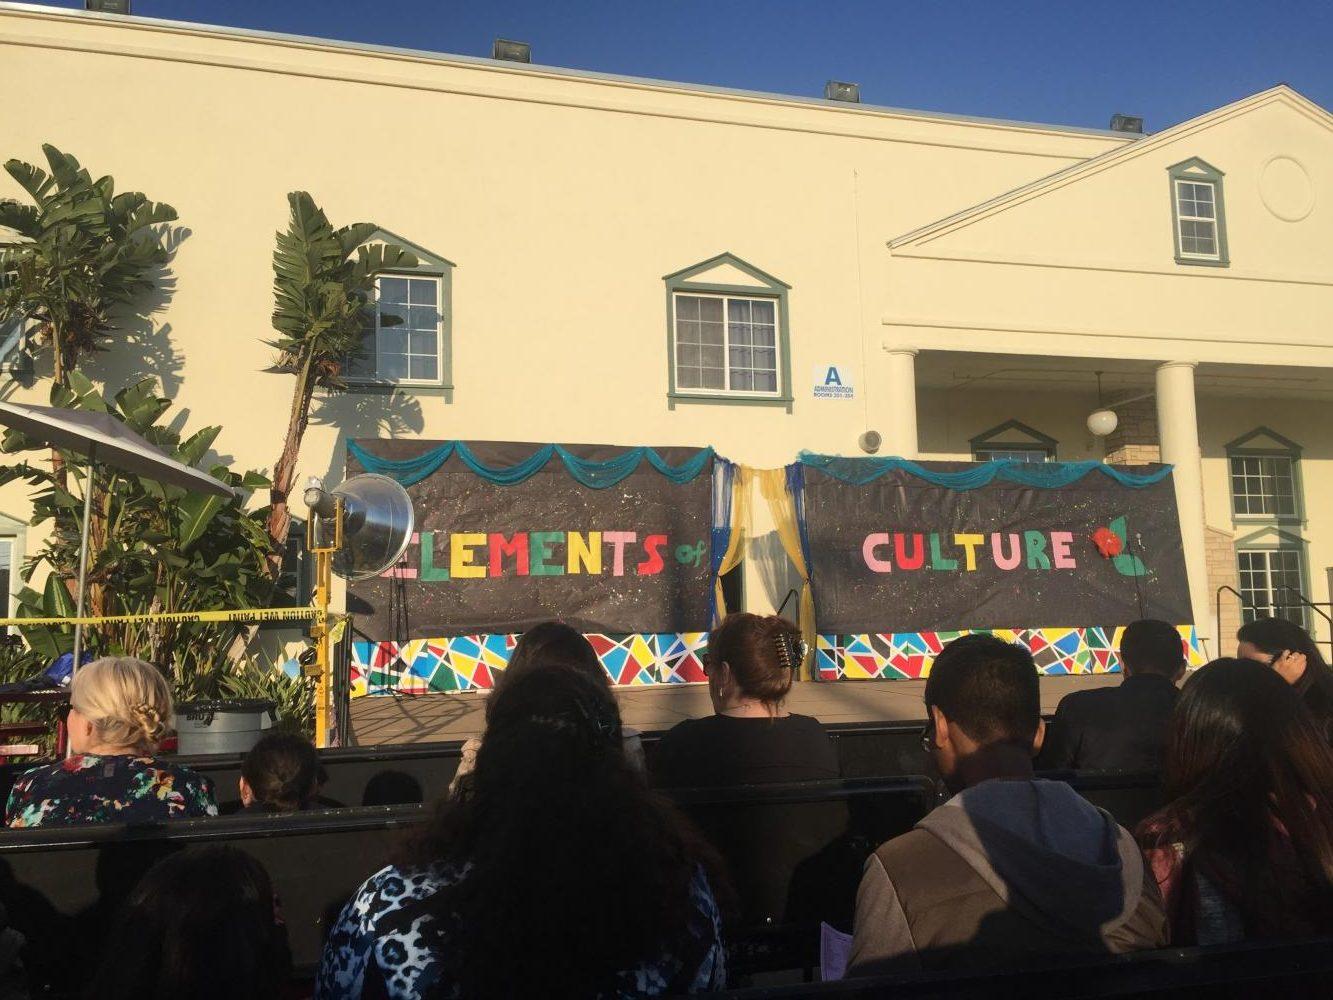 Elements of Culture. Photo Source: Cristina G.